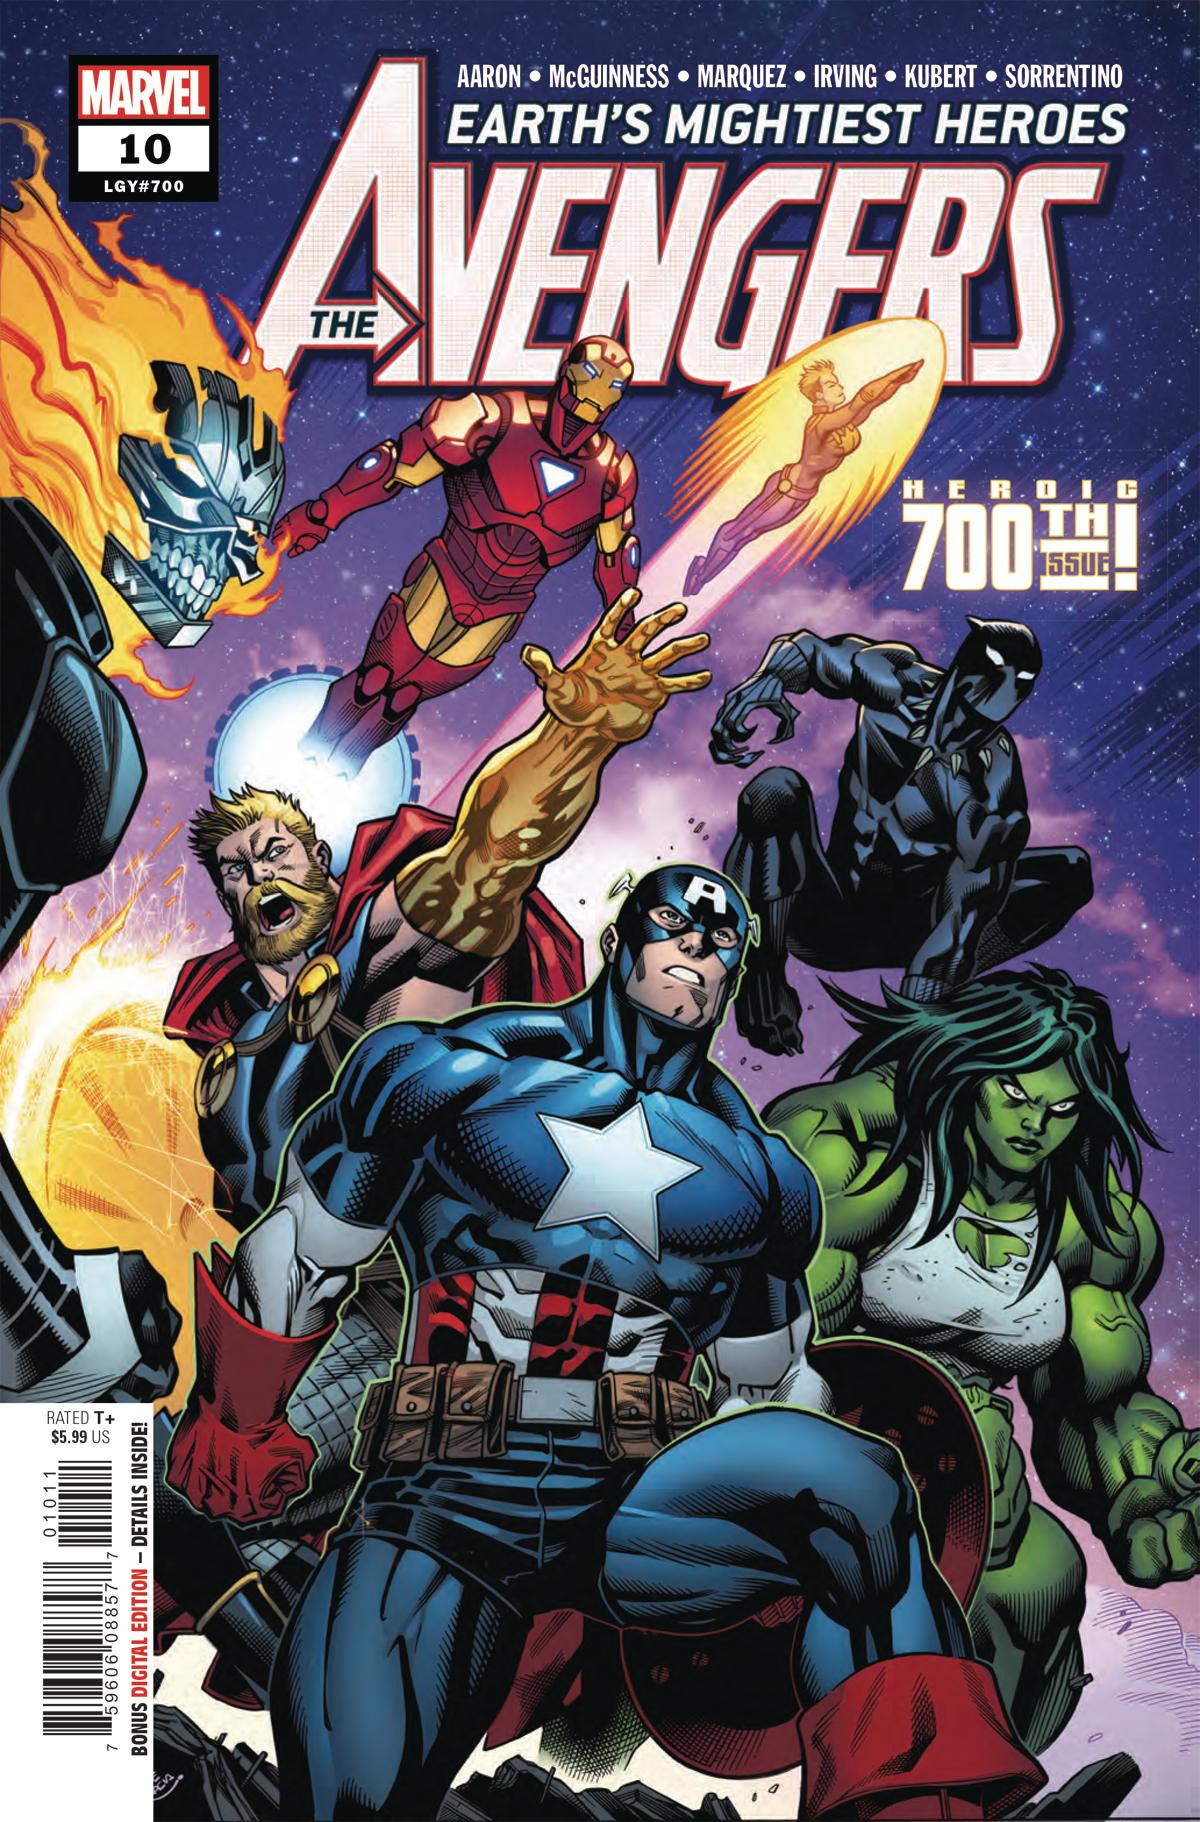 Avengers Vol 8 10 | Marvel Database | FANDOM powered by Wikia